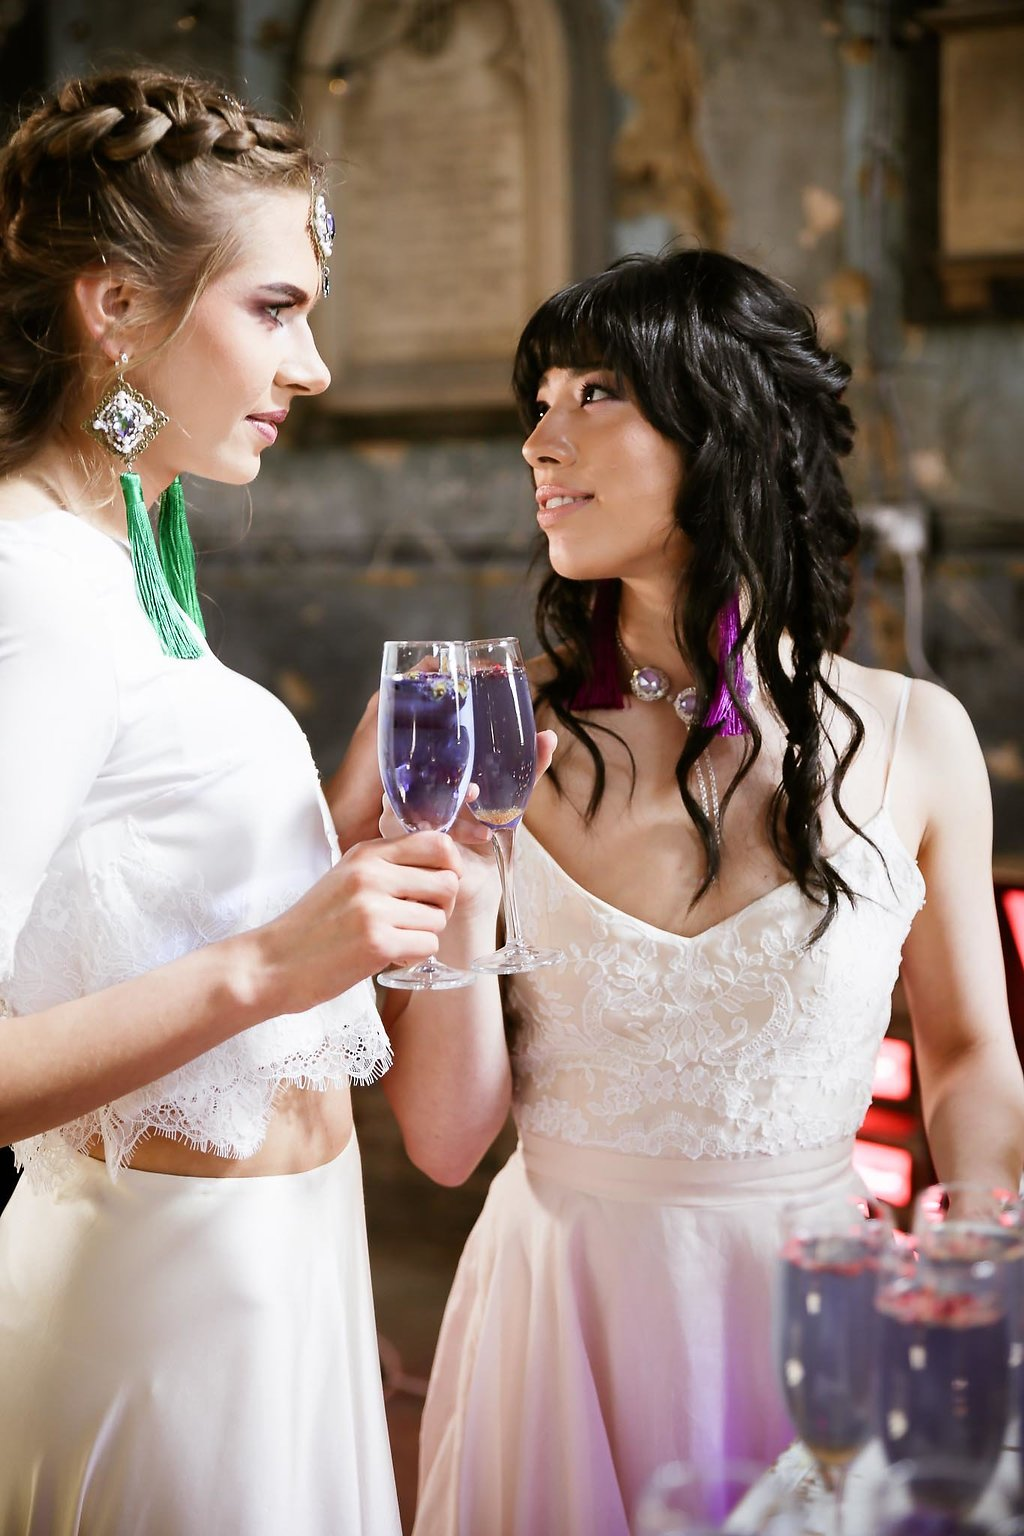 Rock the Purple Love - Gido Weddings - The Asylum Chapel - alternative wedding inspiration 115 - Rock the Purple Love - Gido Weddings - The Asylum Chapel - alternative wedding inspiration 117 - Urban, modern wedding